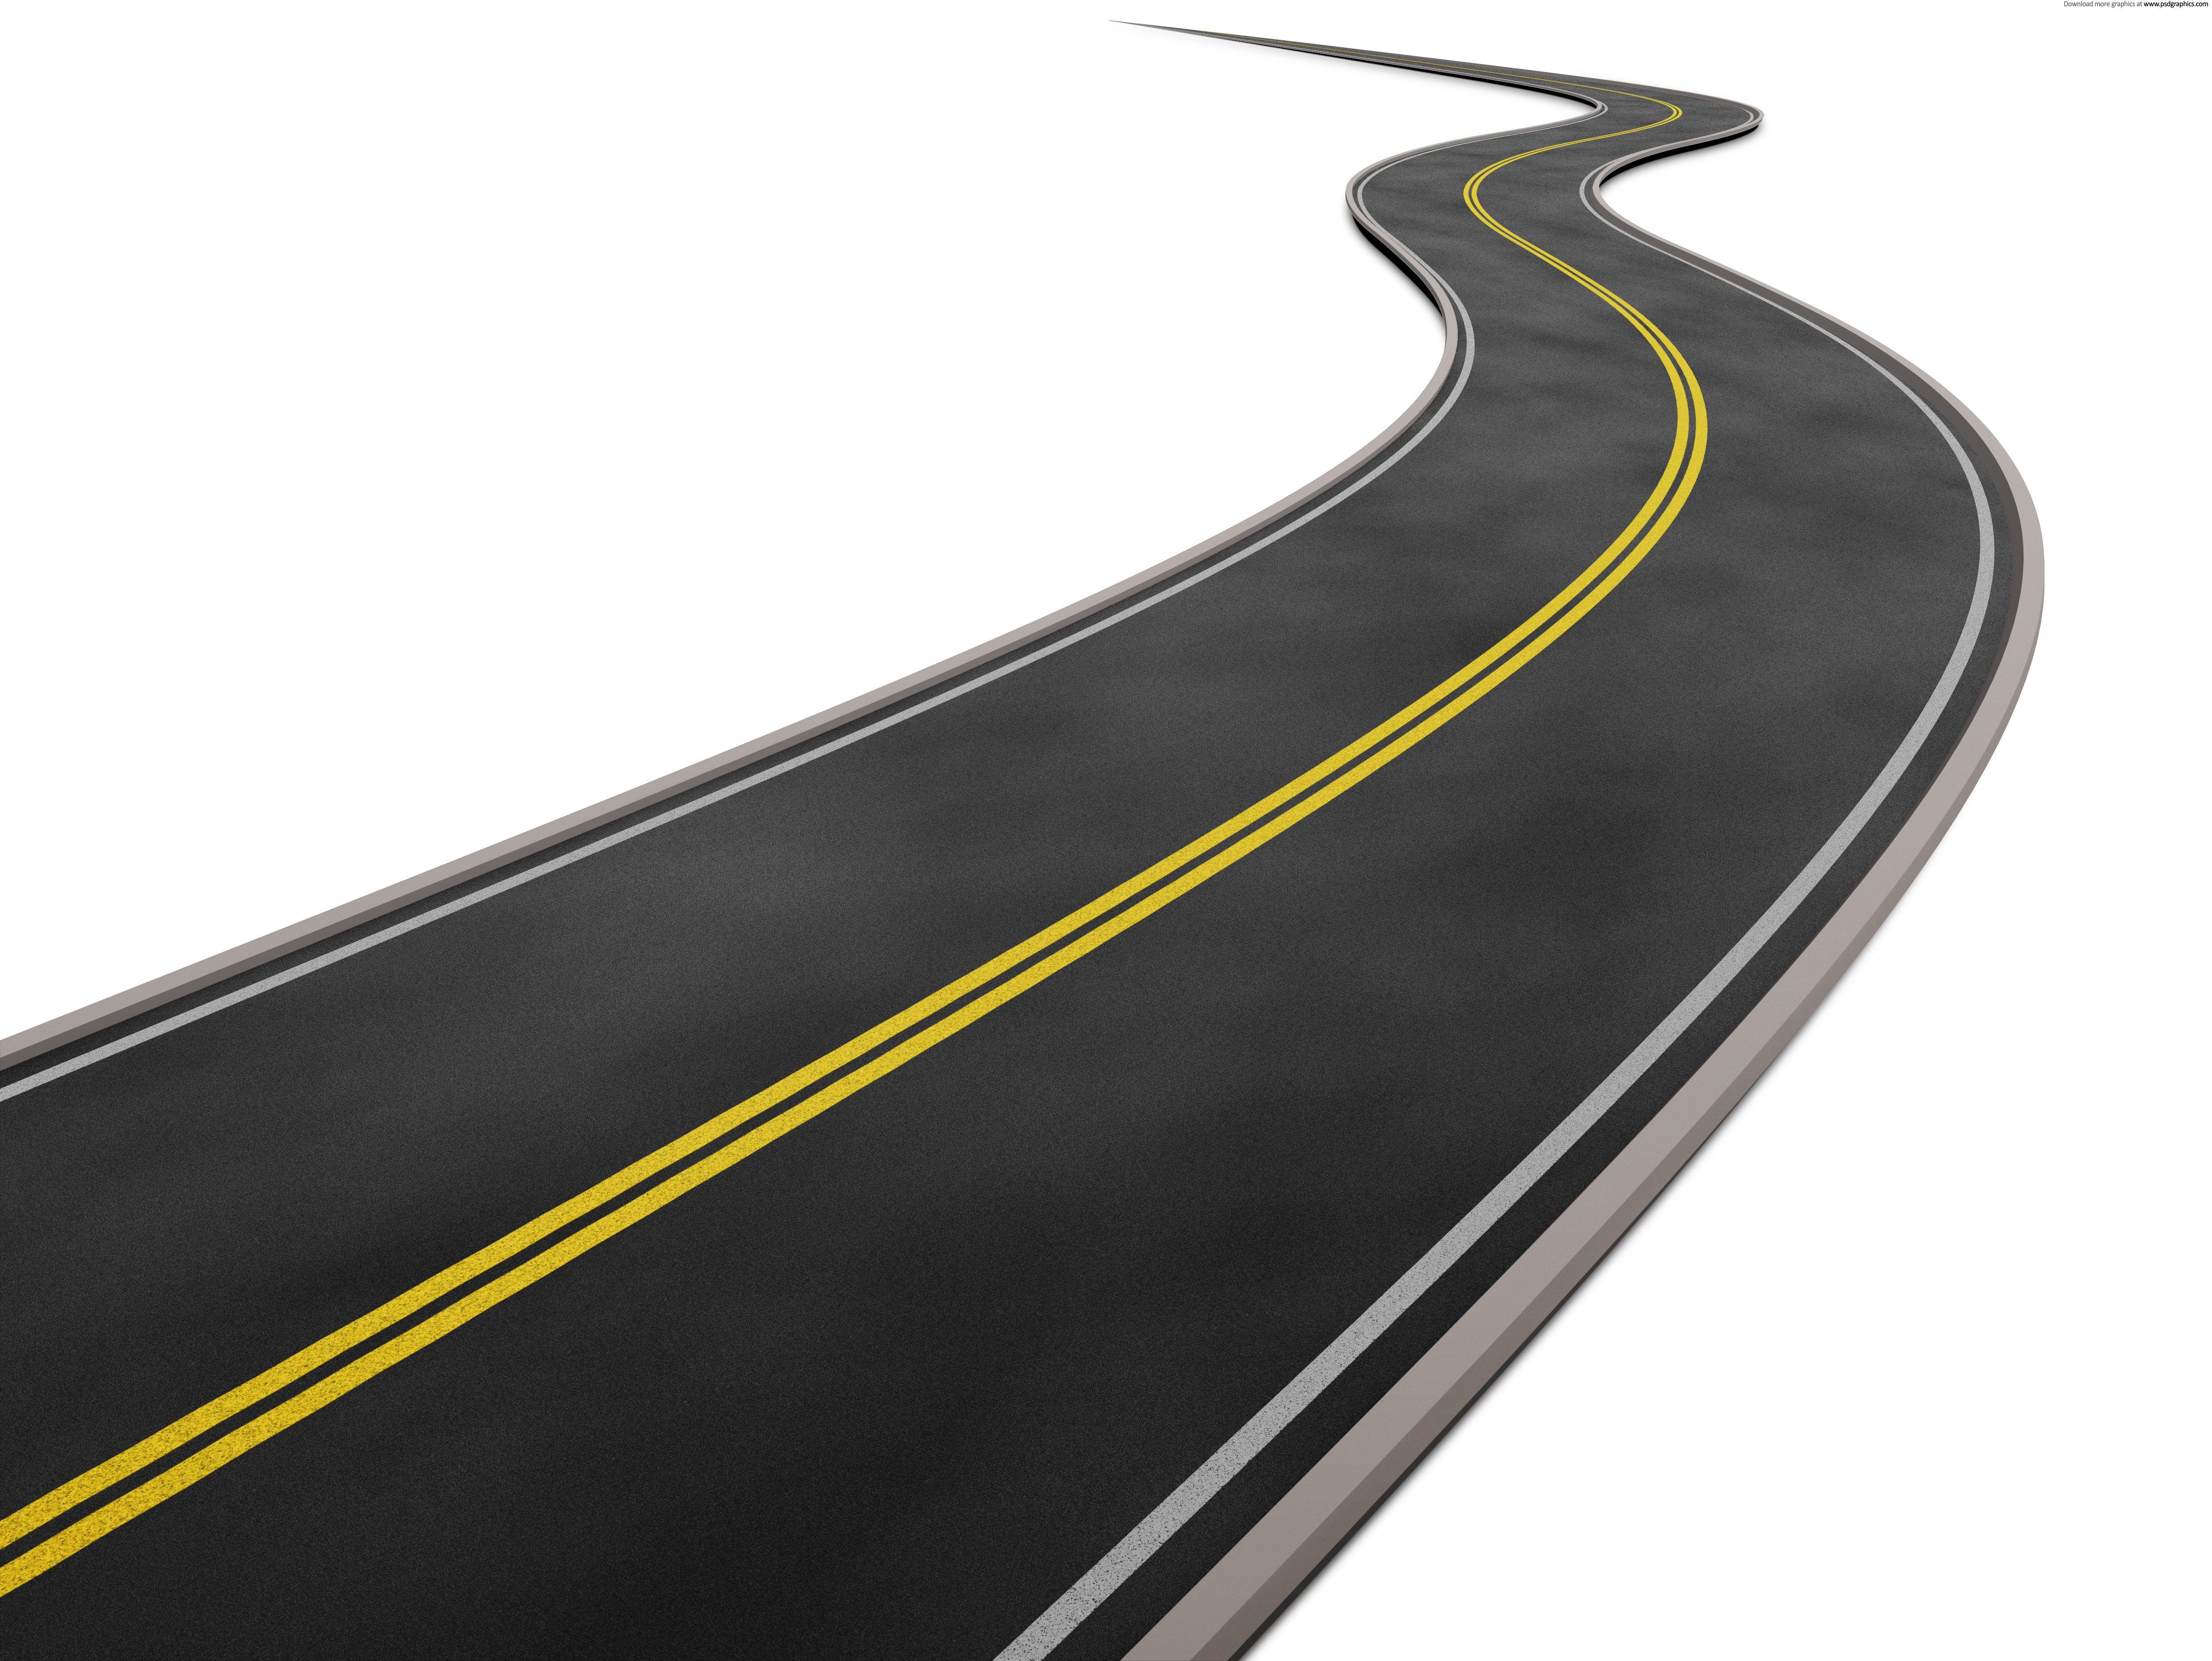 roads.png - Google Search : Digital imaging project 1 : Pinterest ...